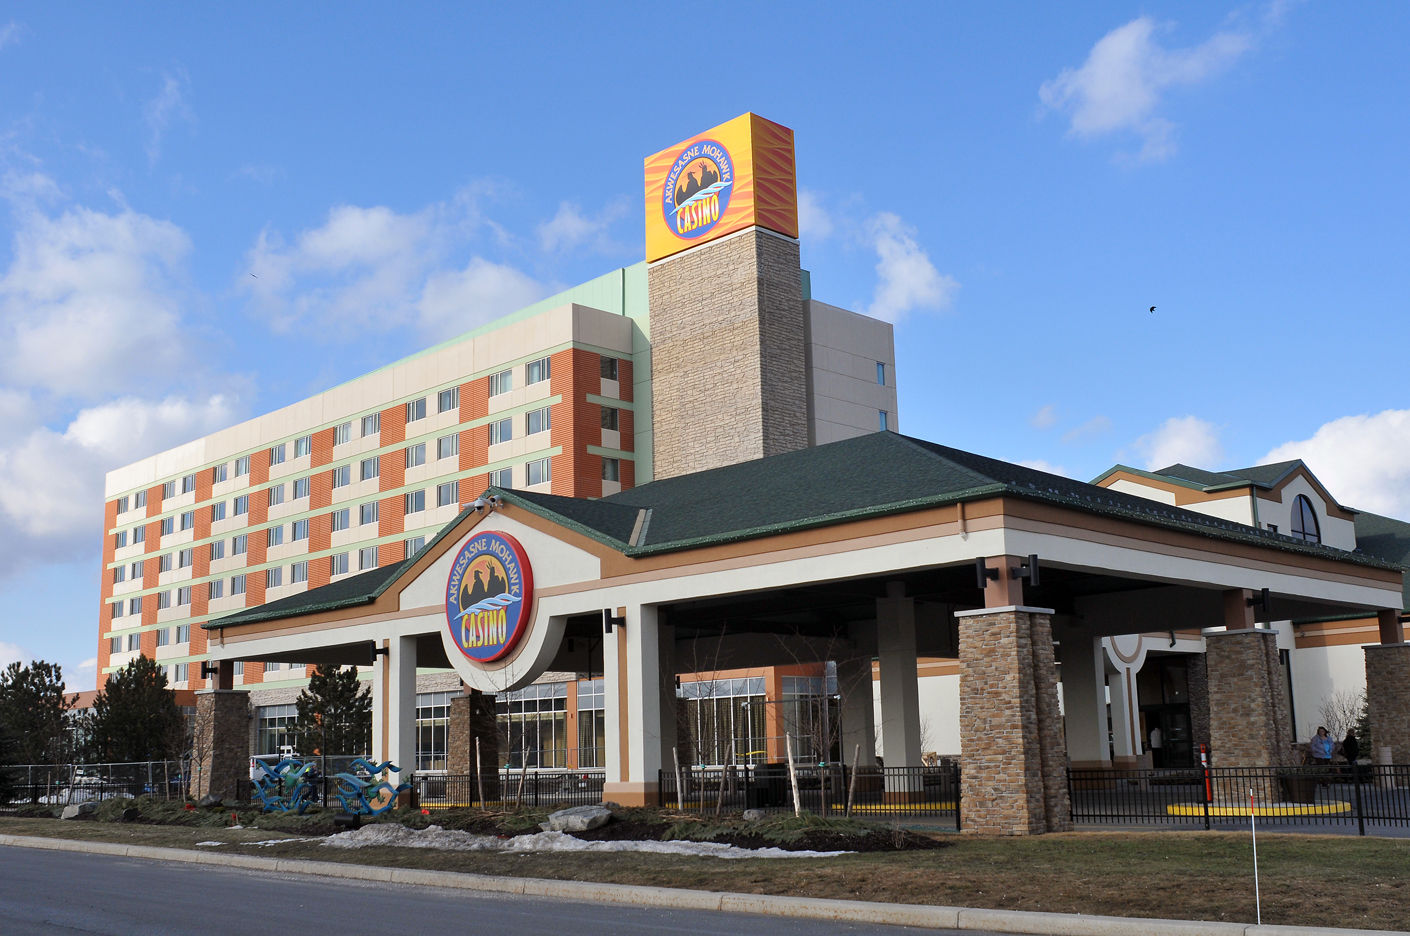 firekeepers casino location